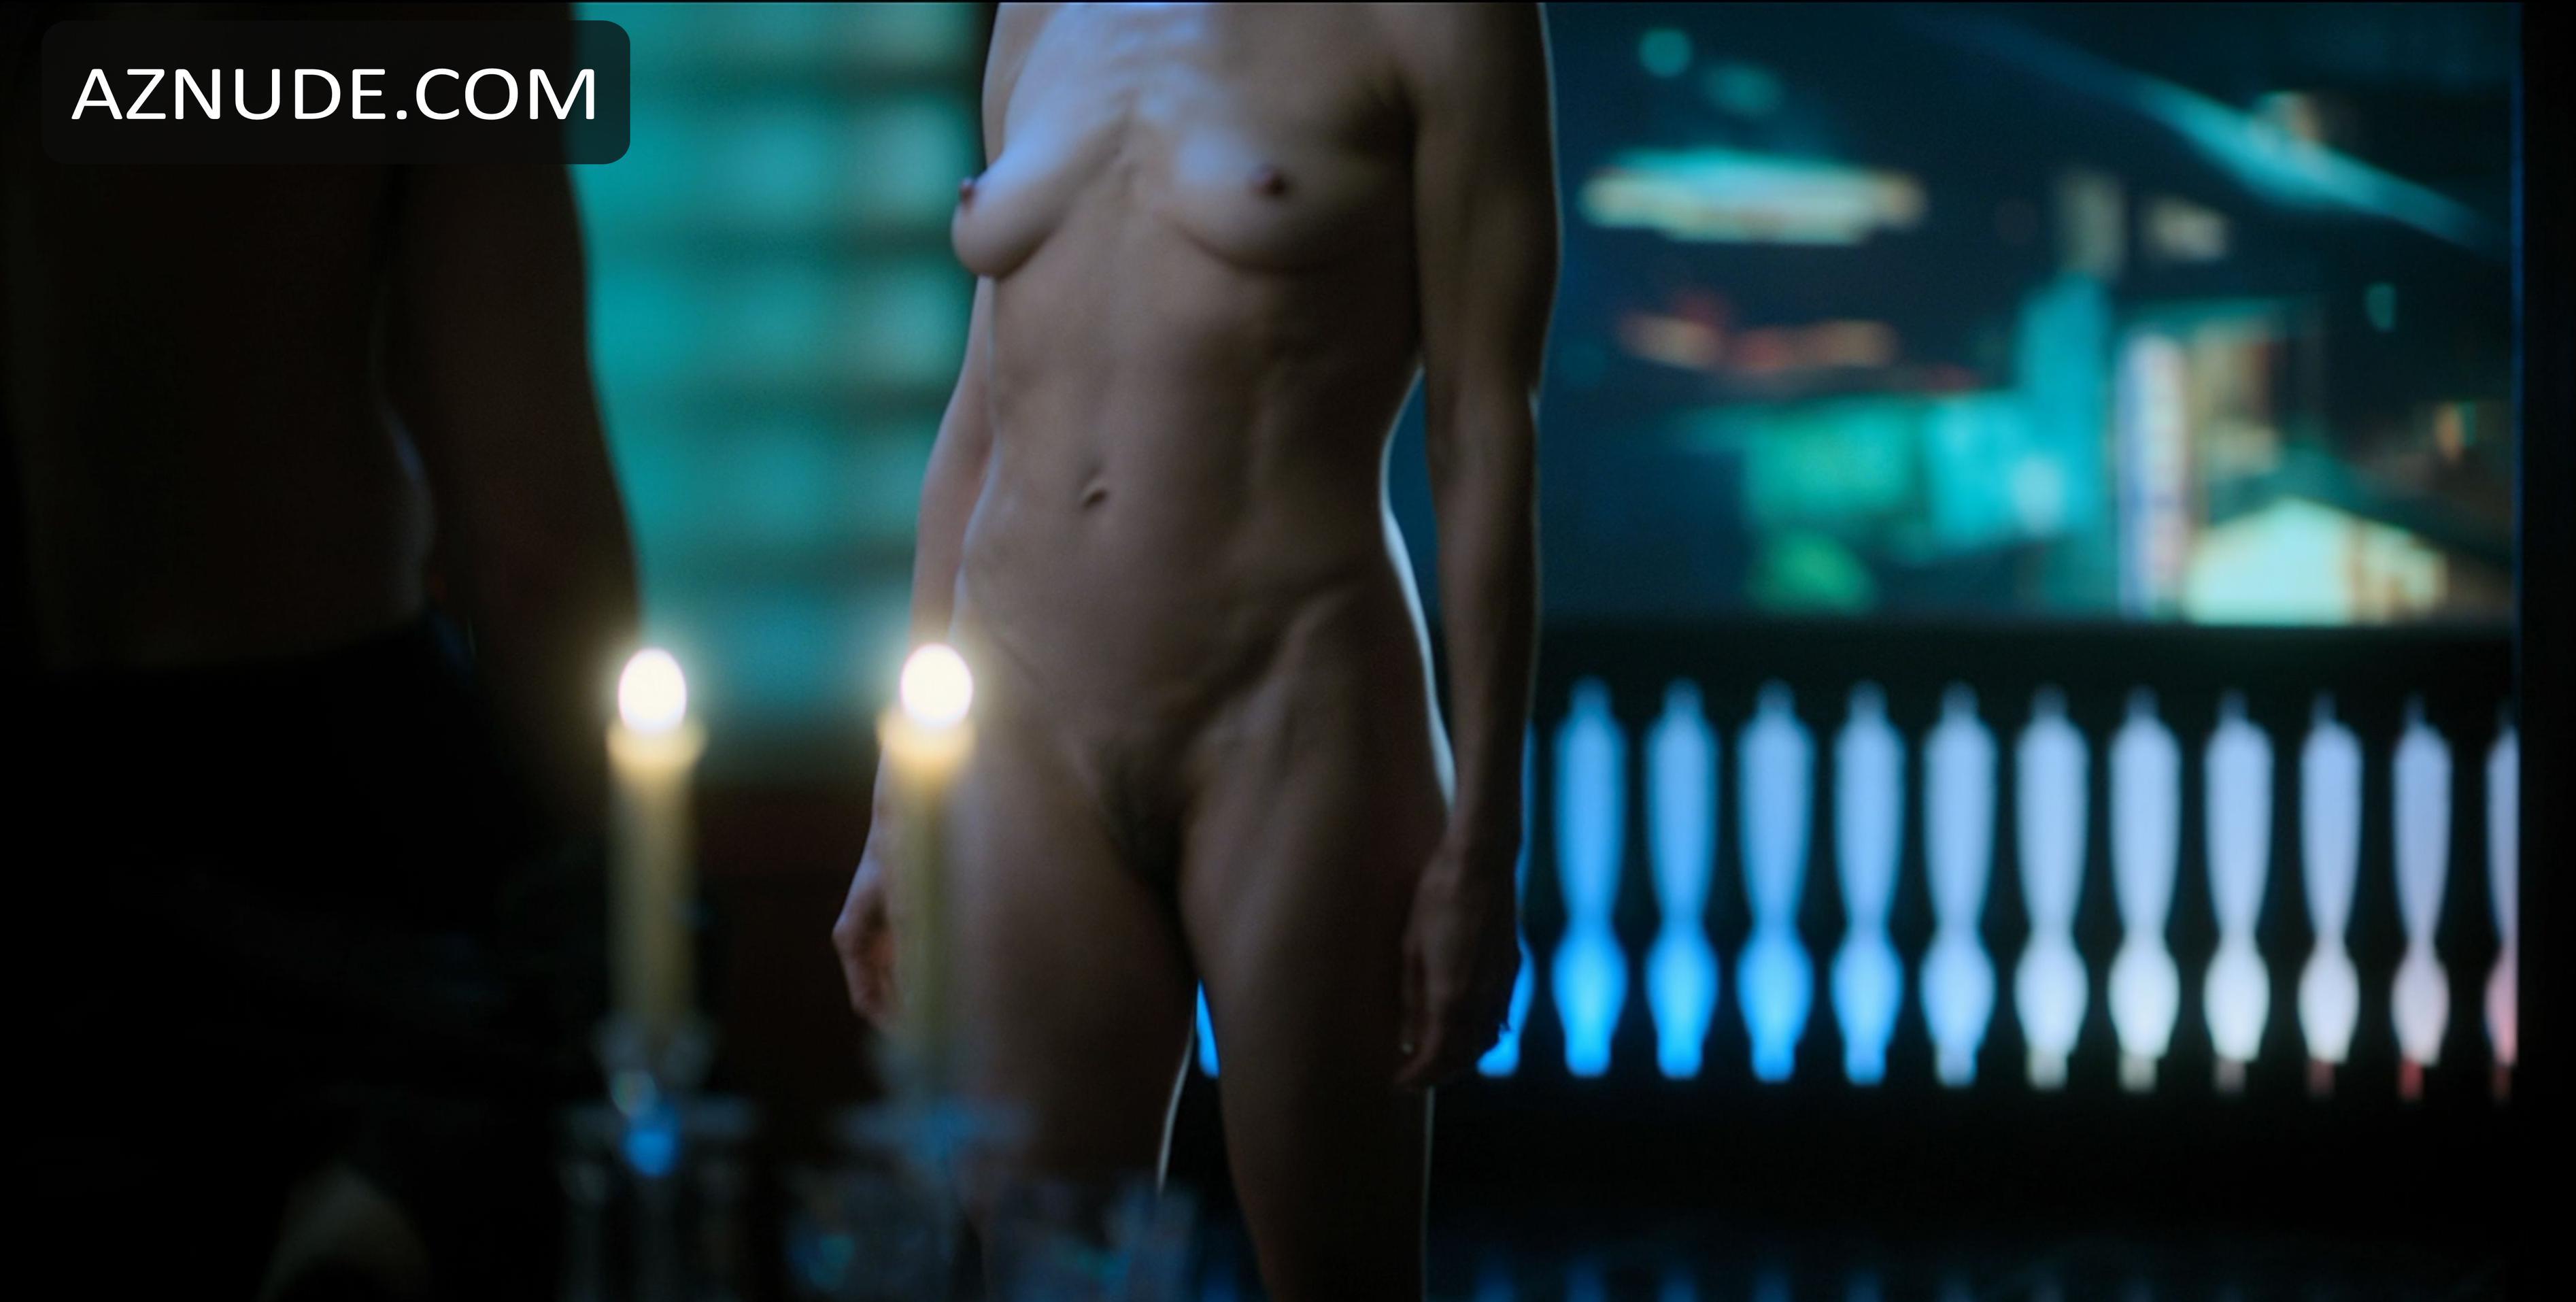 Alex kingston nude in virtual encounters 2 scandalplanetcom - 3 7